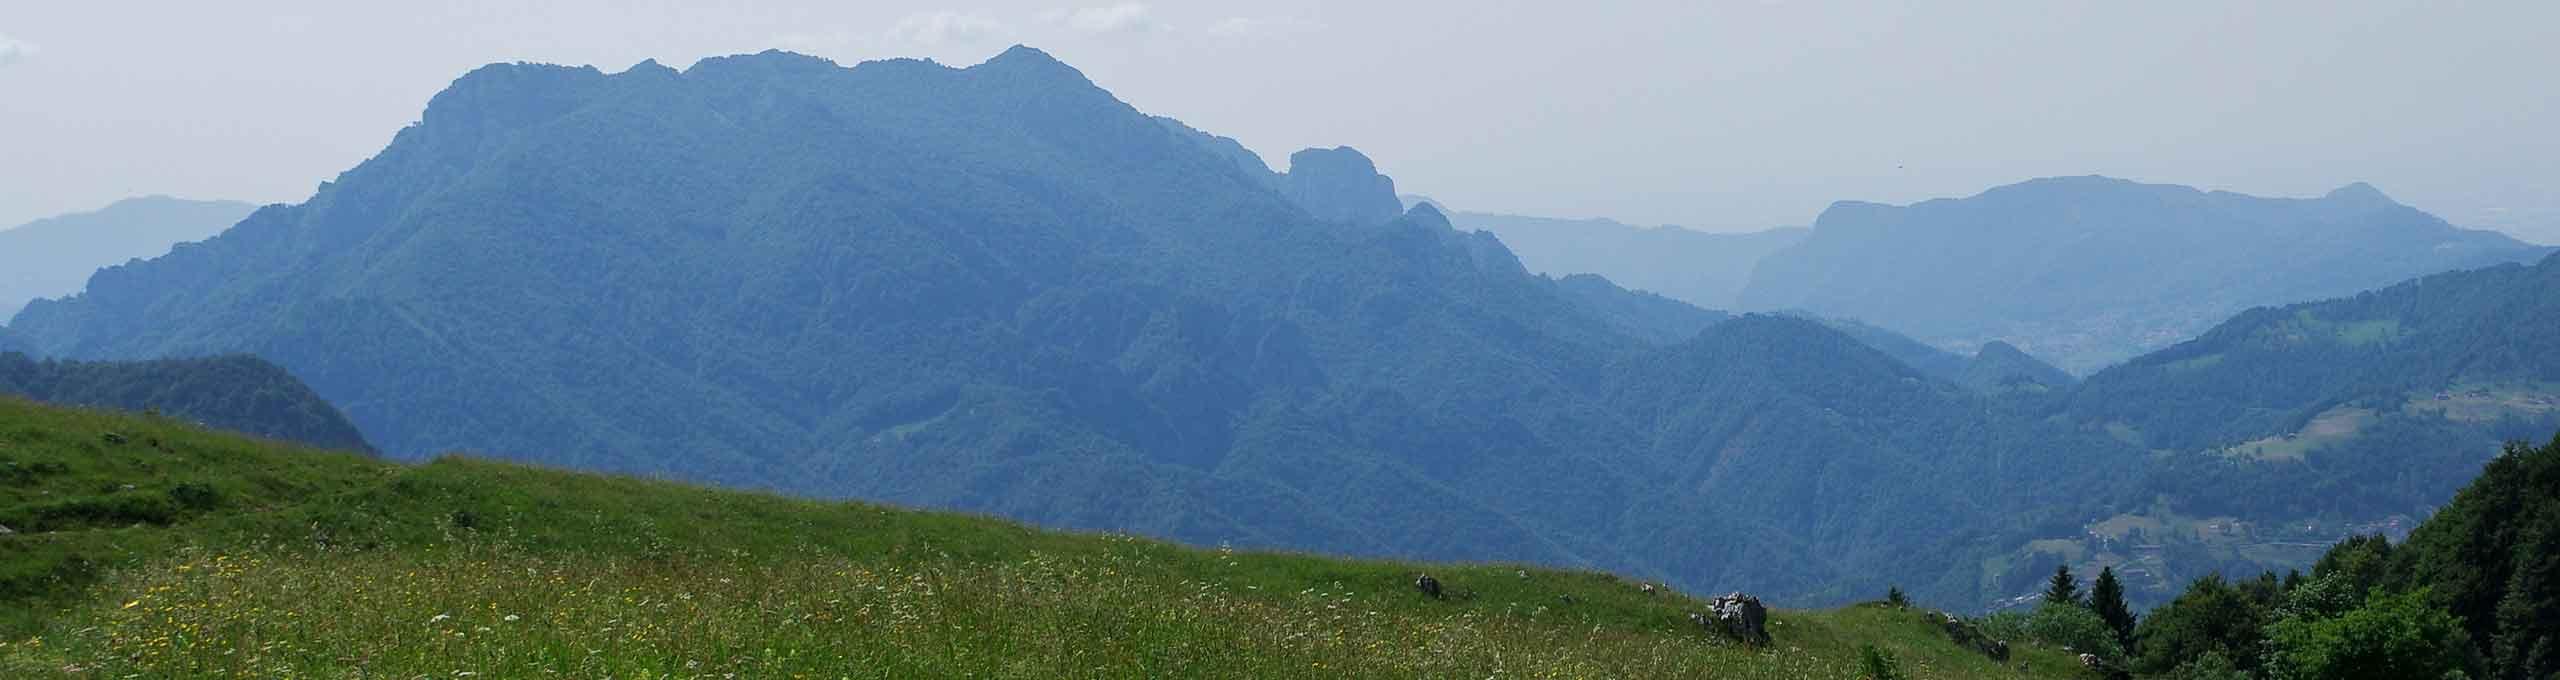 Taleggio, Val Brembana